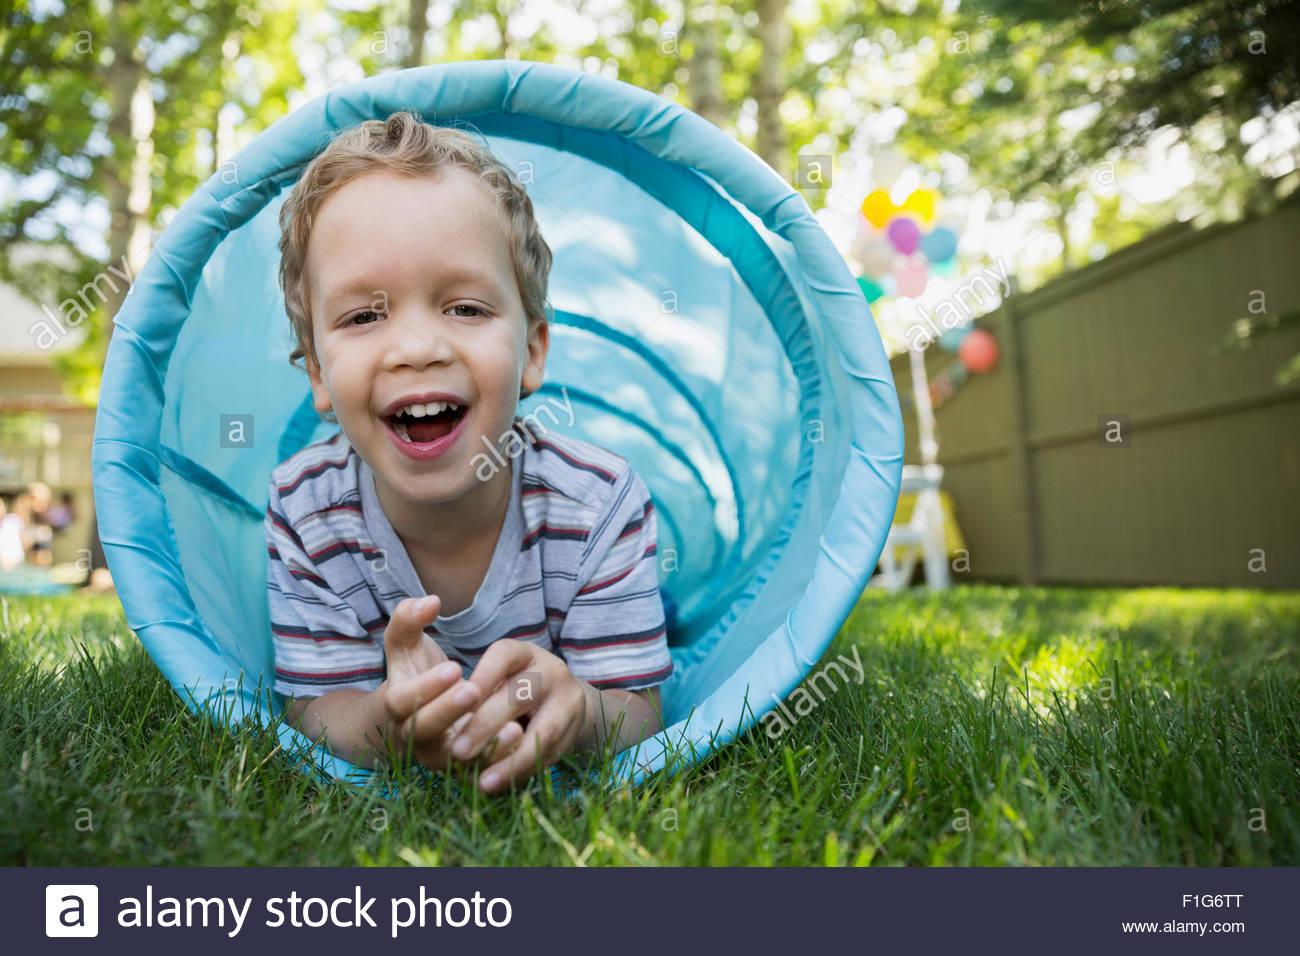 Portrait smiling boy inside toy tunnel in backyard - Stock Image